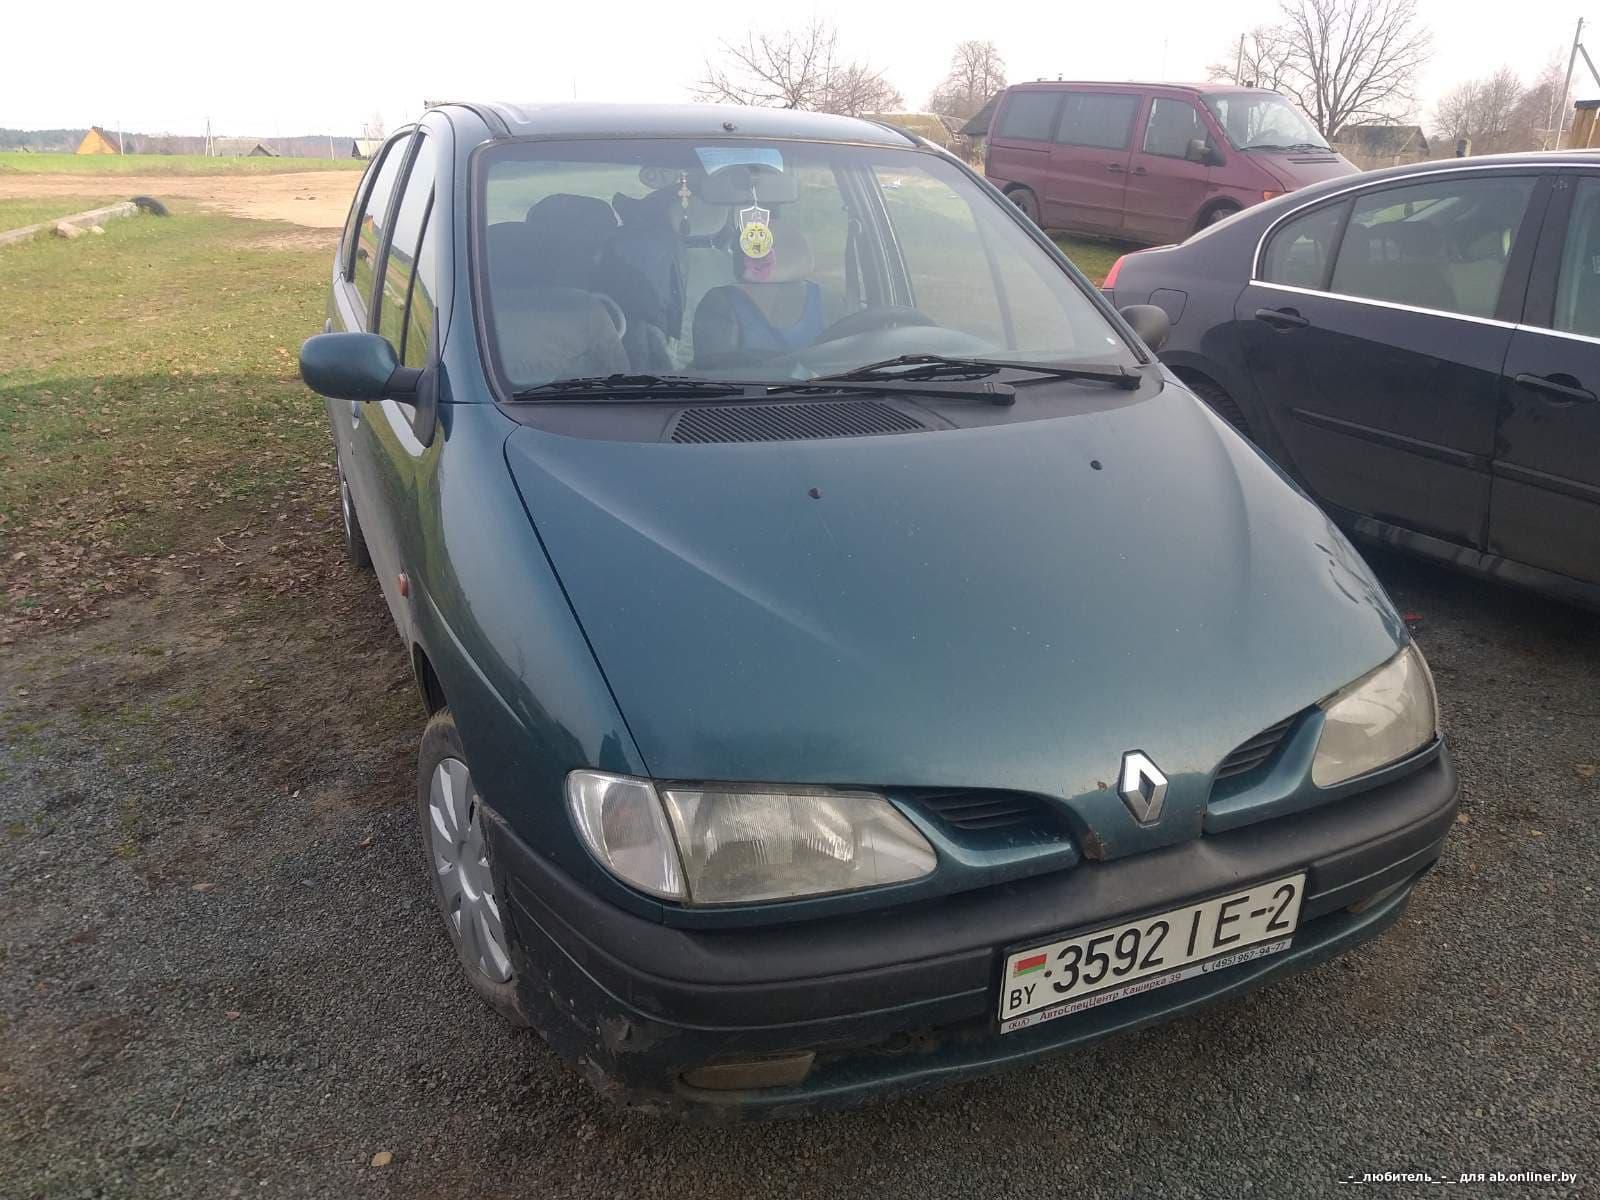 Renault Megane Scenic Tdi